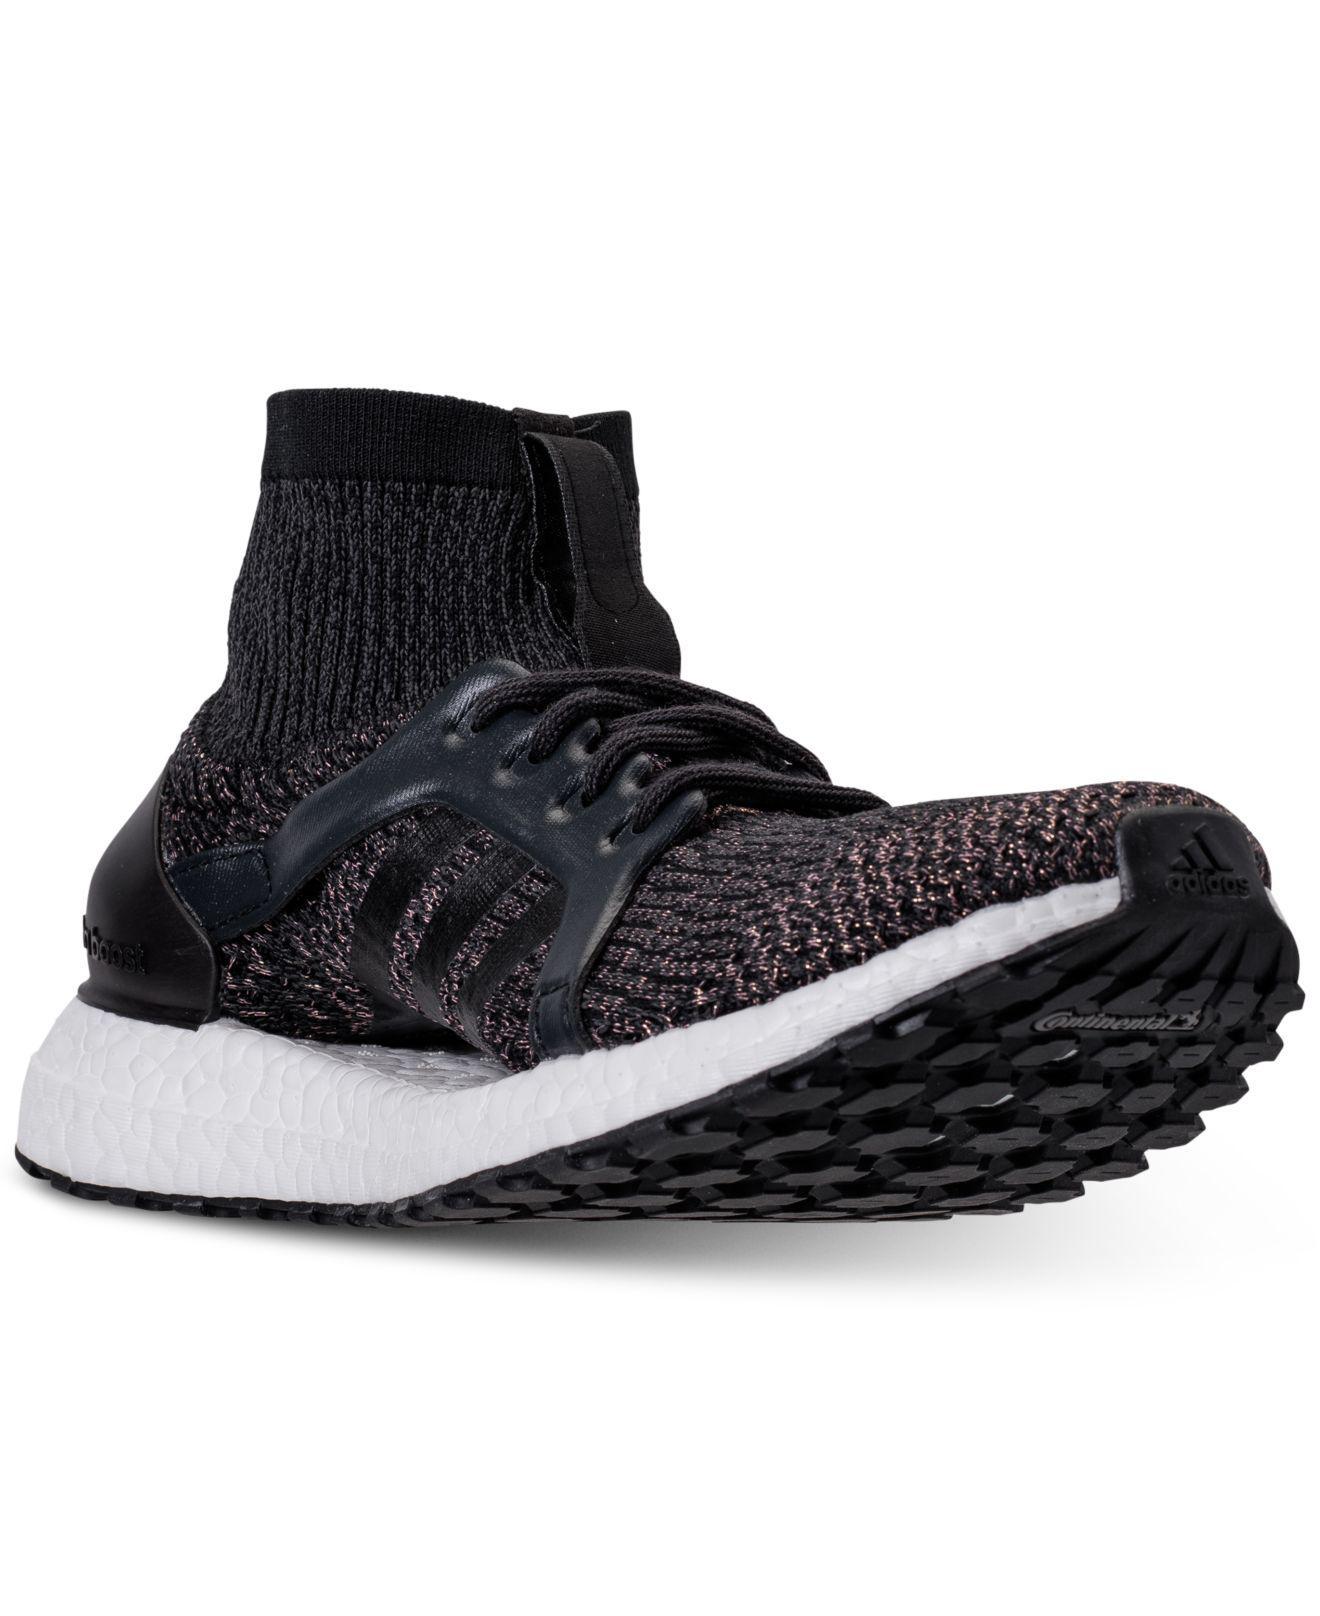 7c138d6be Lyst - adidas Ultraboost X Atr Ltd Running Sneakers From Finish Line ...